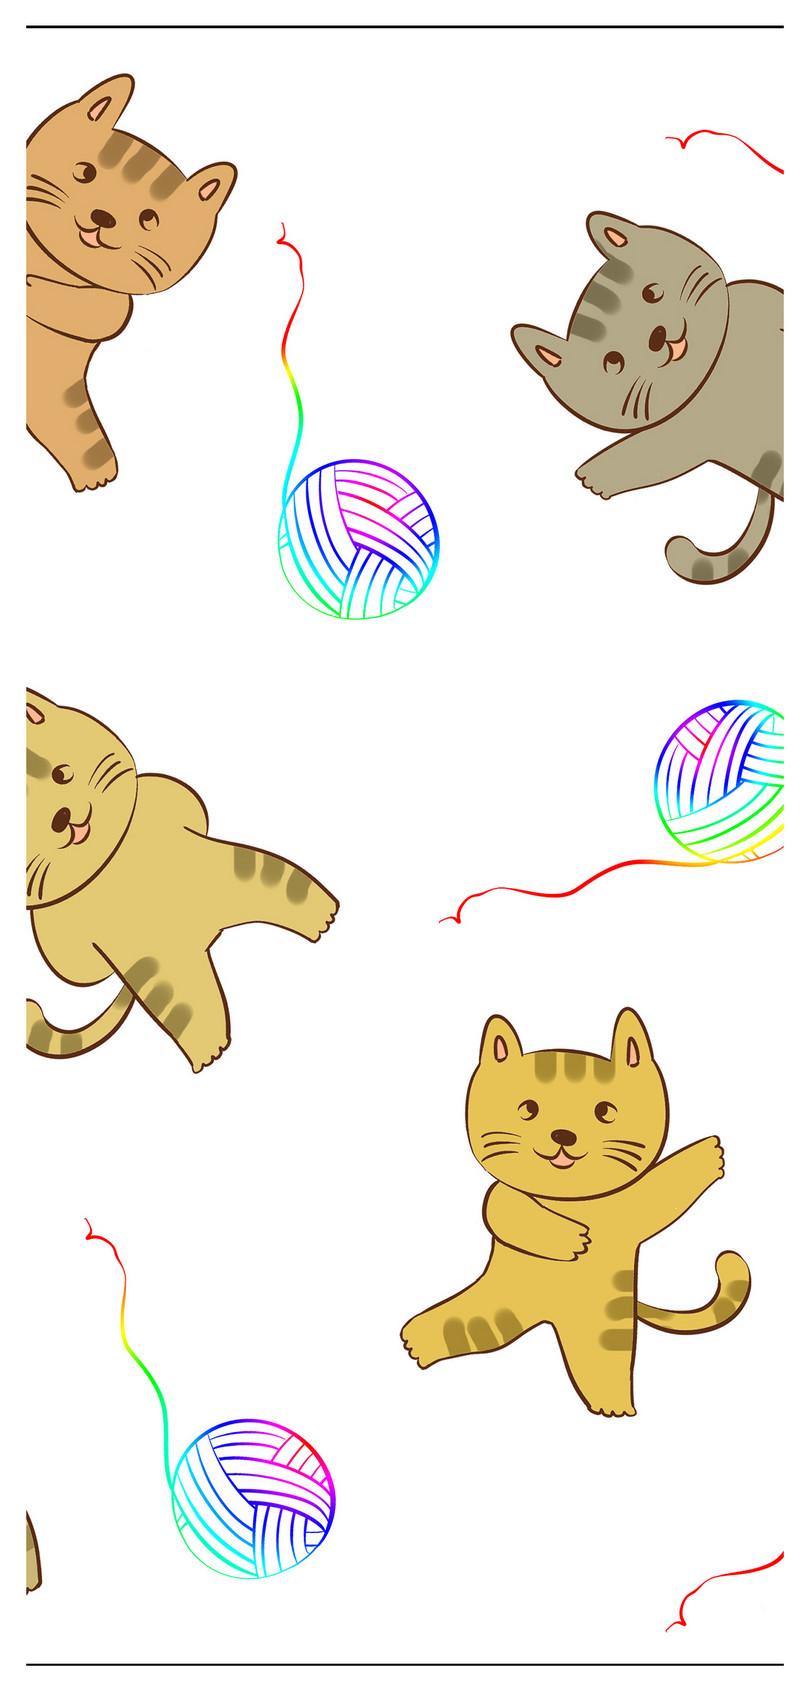 Gambar Kucing Lucu Kartun : gambar, kucing, kartun, Gambar, Kucing, Comel, Cartoon, 81021+, Untuk, Comel,